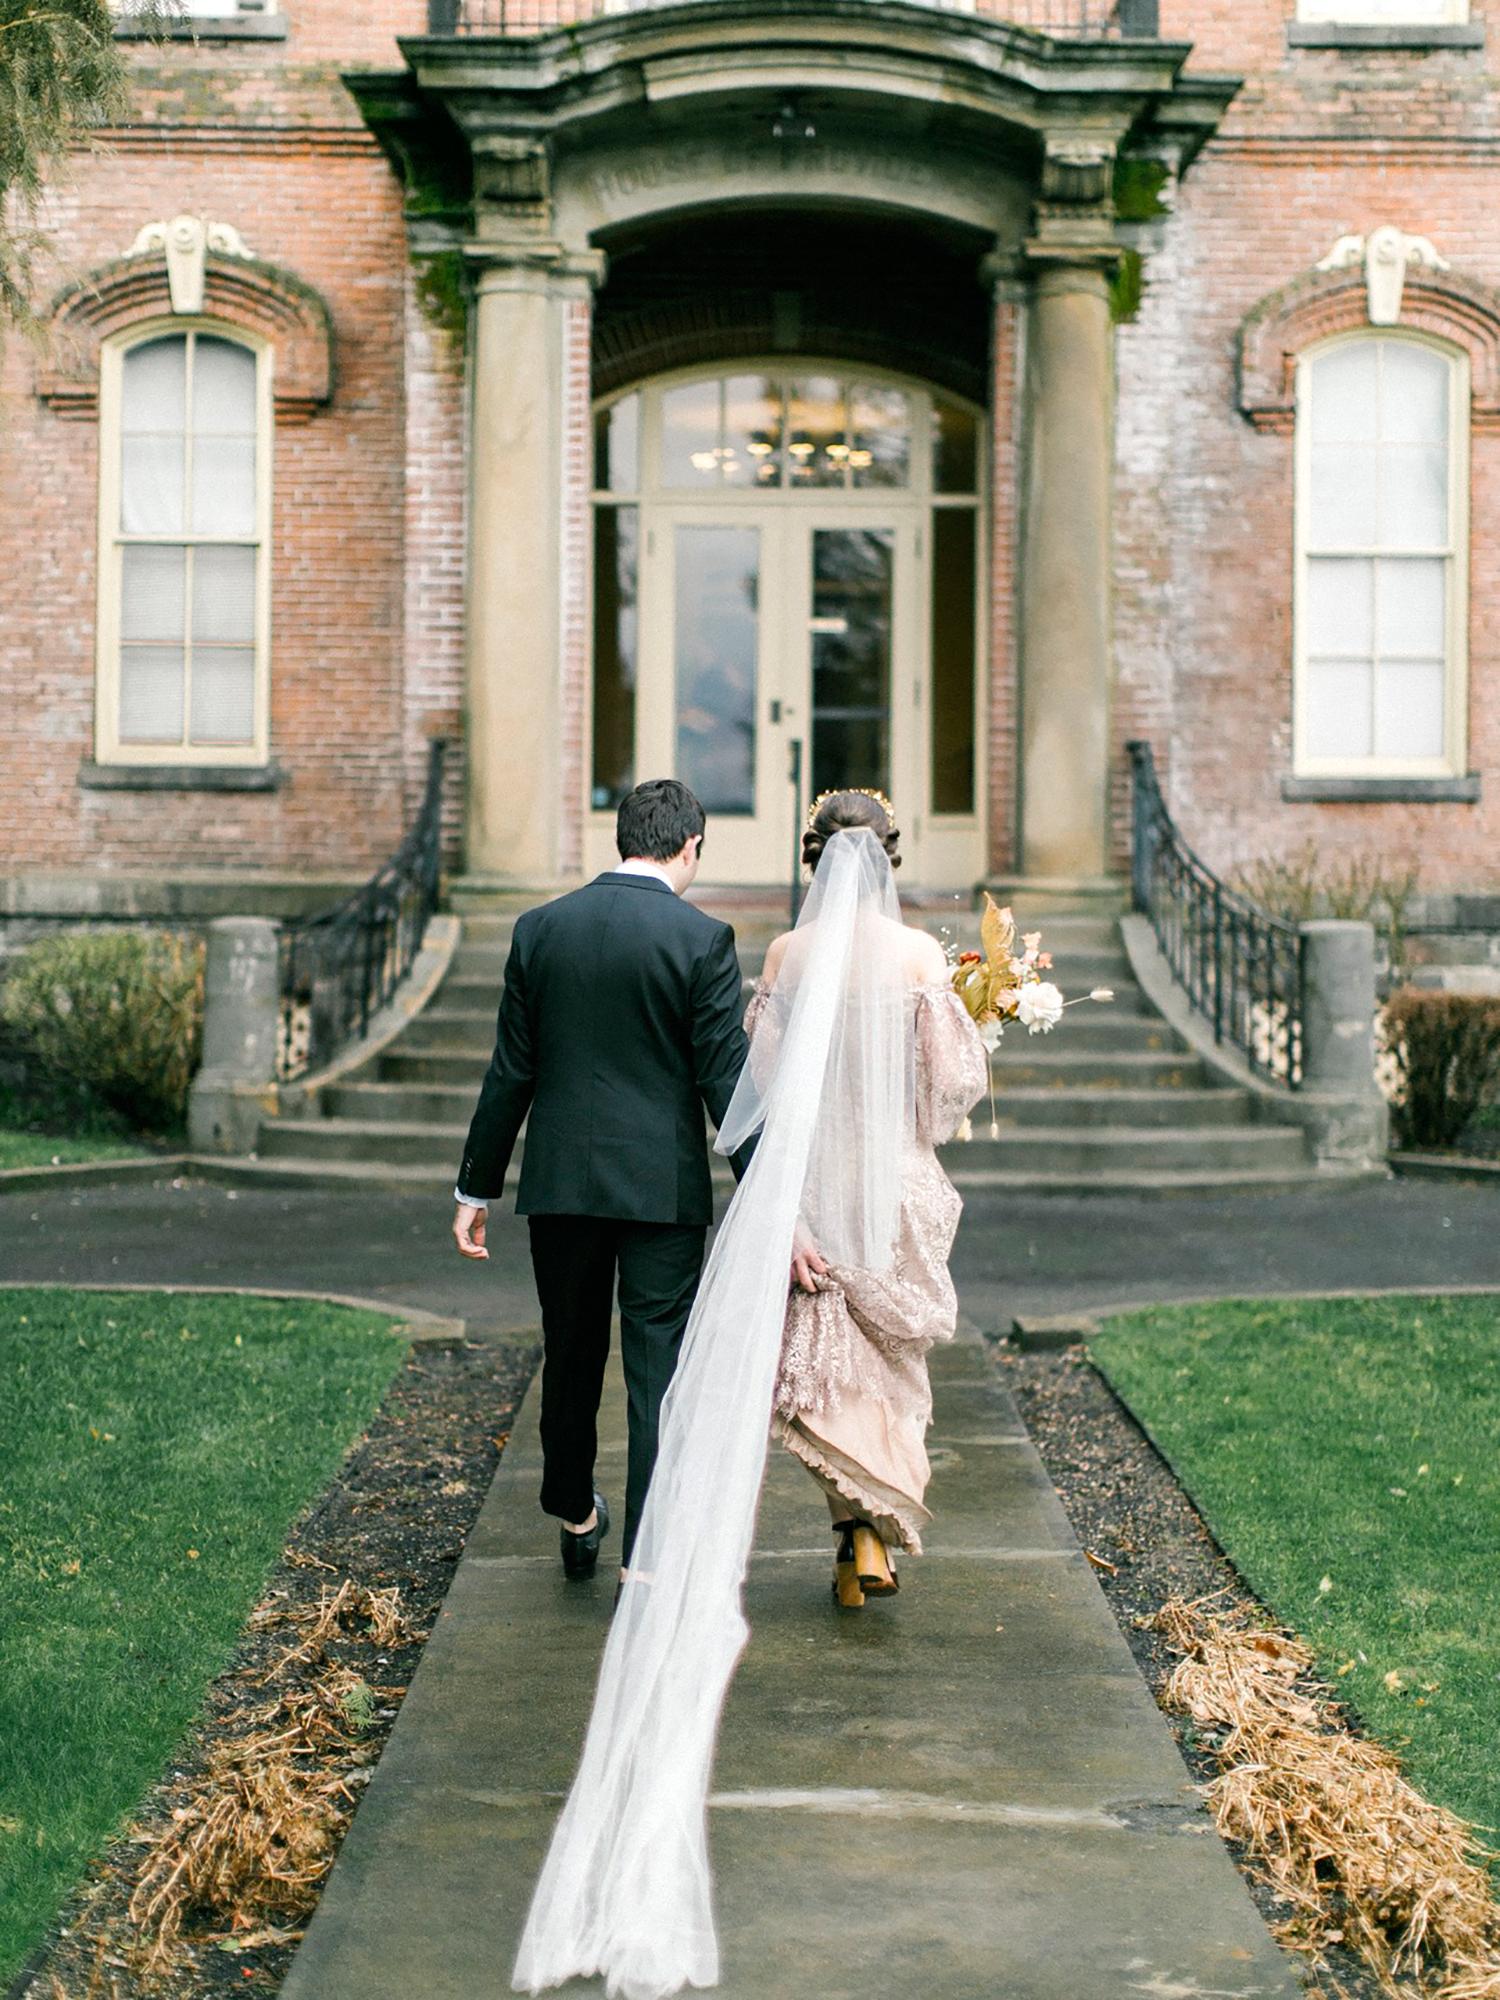 kae danny wedding couple walking into venue